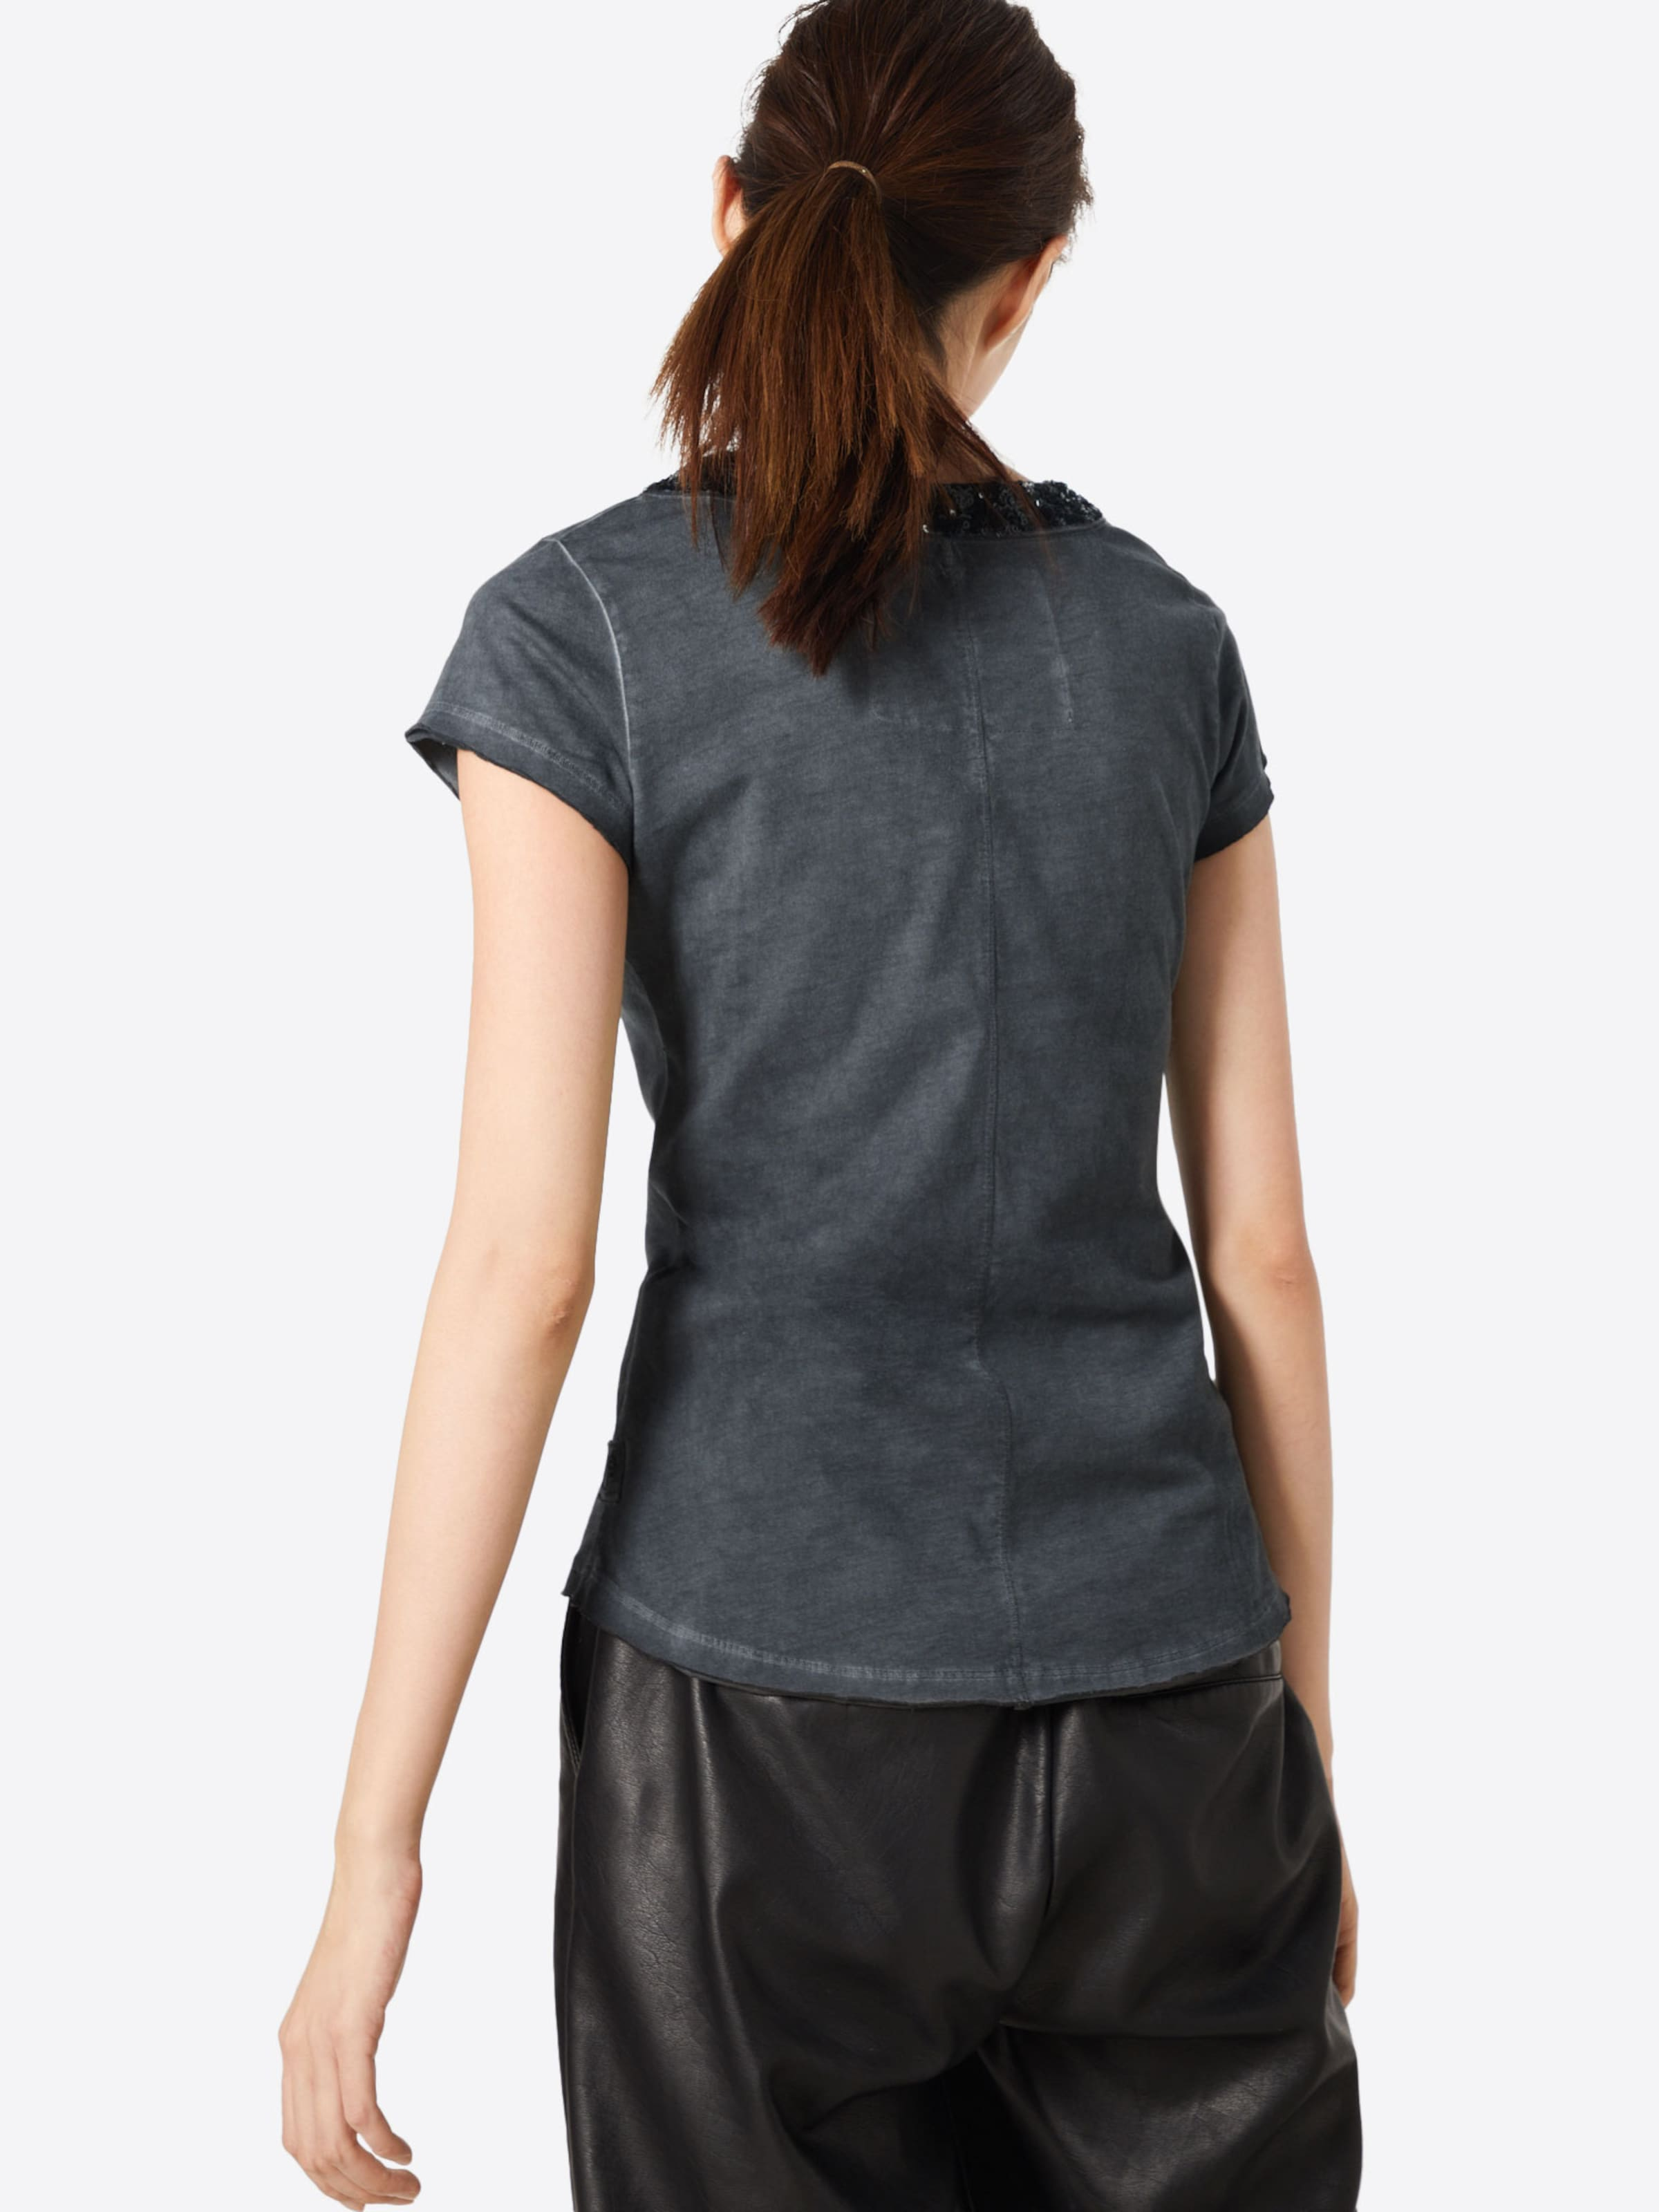 Shirt Marjo T Basaltgrau T Shirt Marjo Basaltgrau Marjo In T In sQxohrBtCd